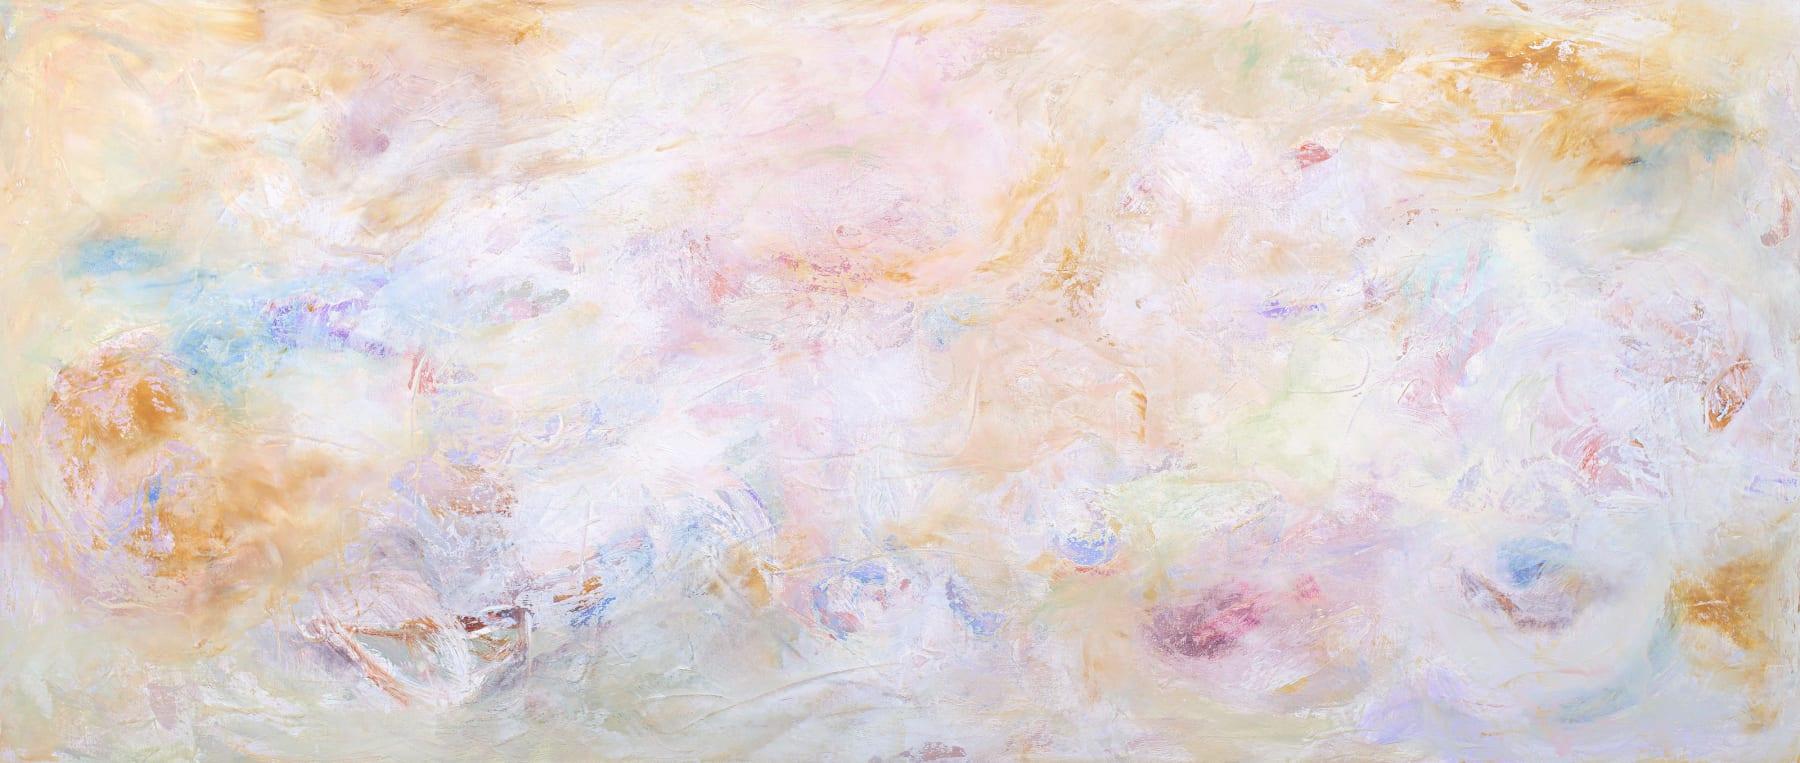 Patricia Qualls, Spring Love, 2020-2021